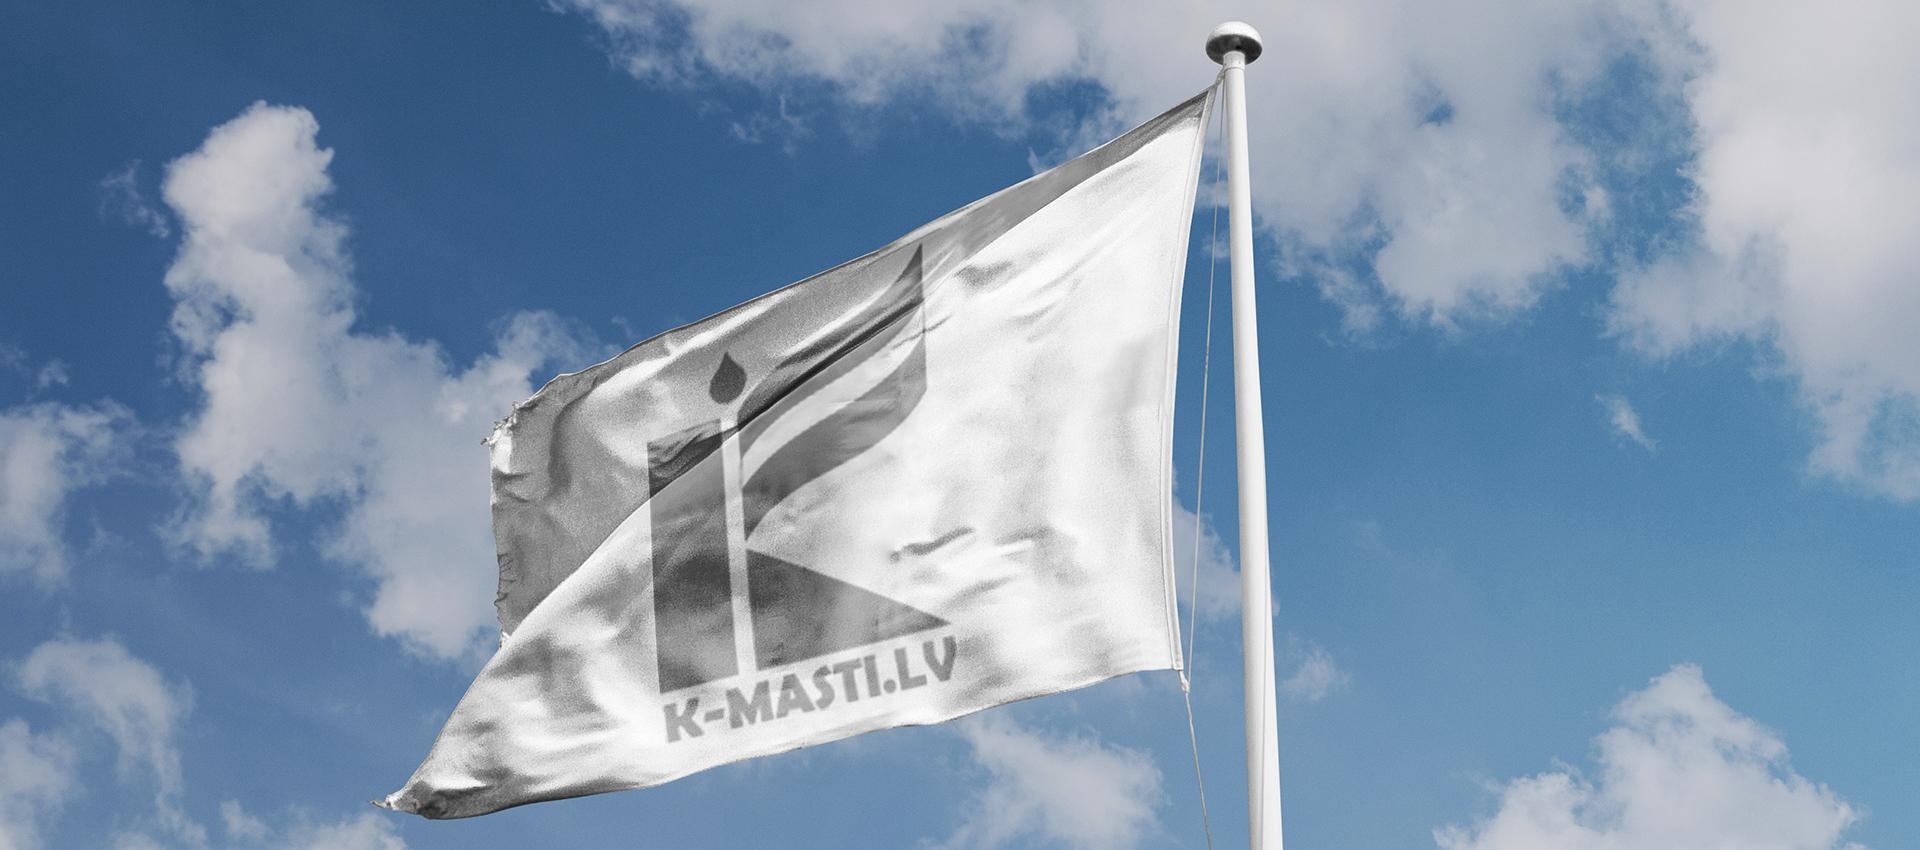 k-masti.lv_karogs